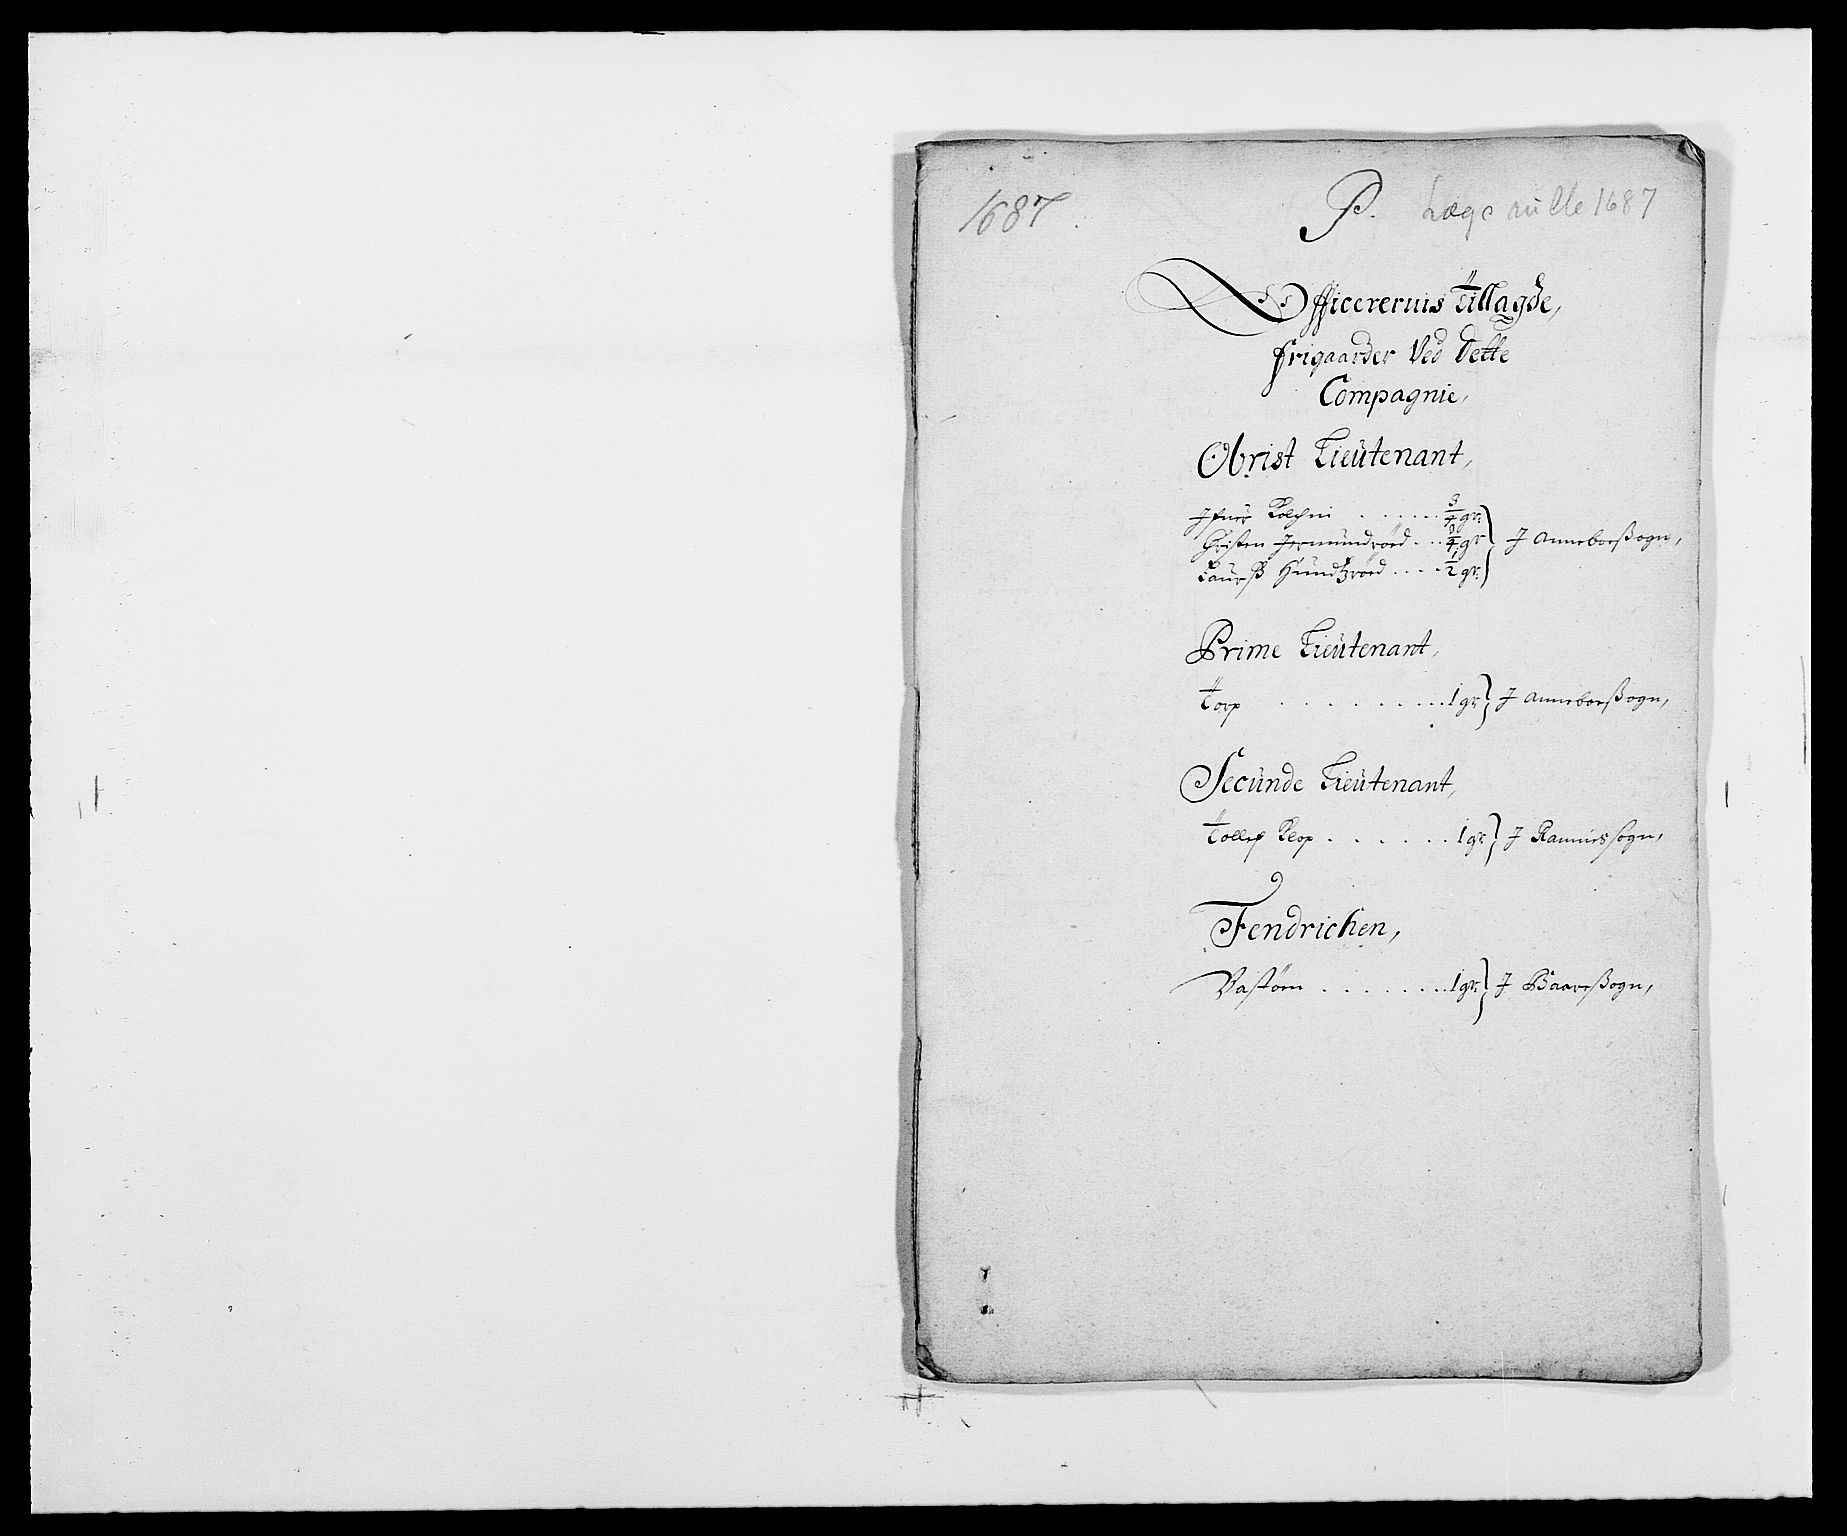 RA, Rentekammeret inntil 1814, Reviderte regnskaper, Fogderegnskap, R32/L1858: Fogderegnskap Jarlsberg grevskap, 1686-1690, s. 209